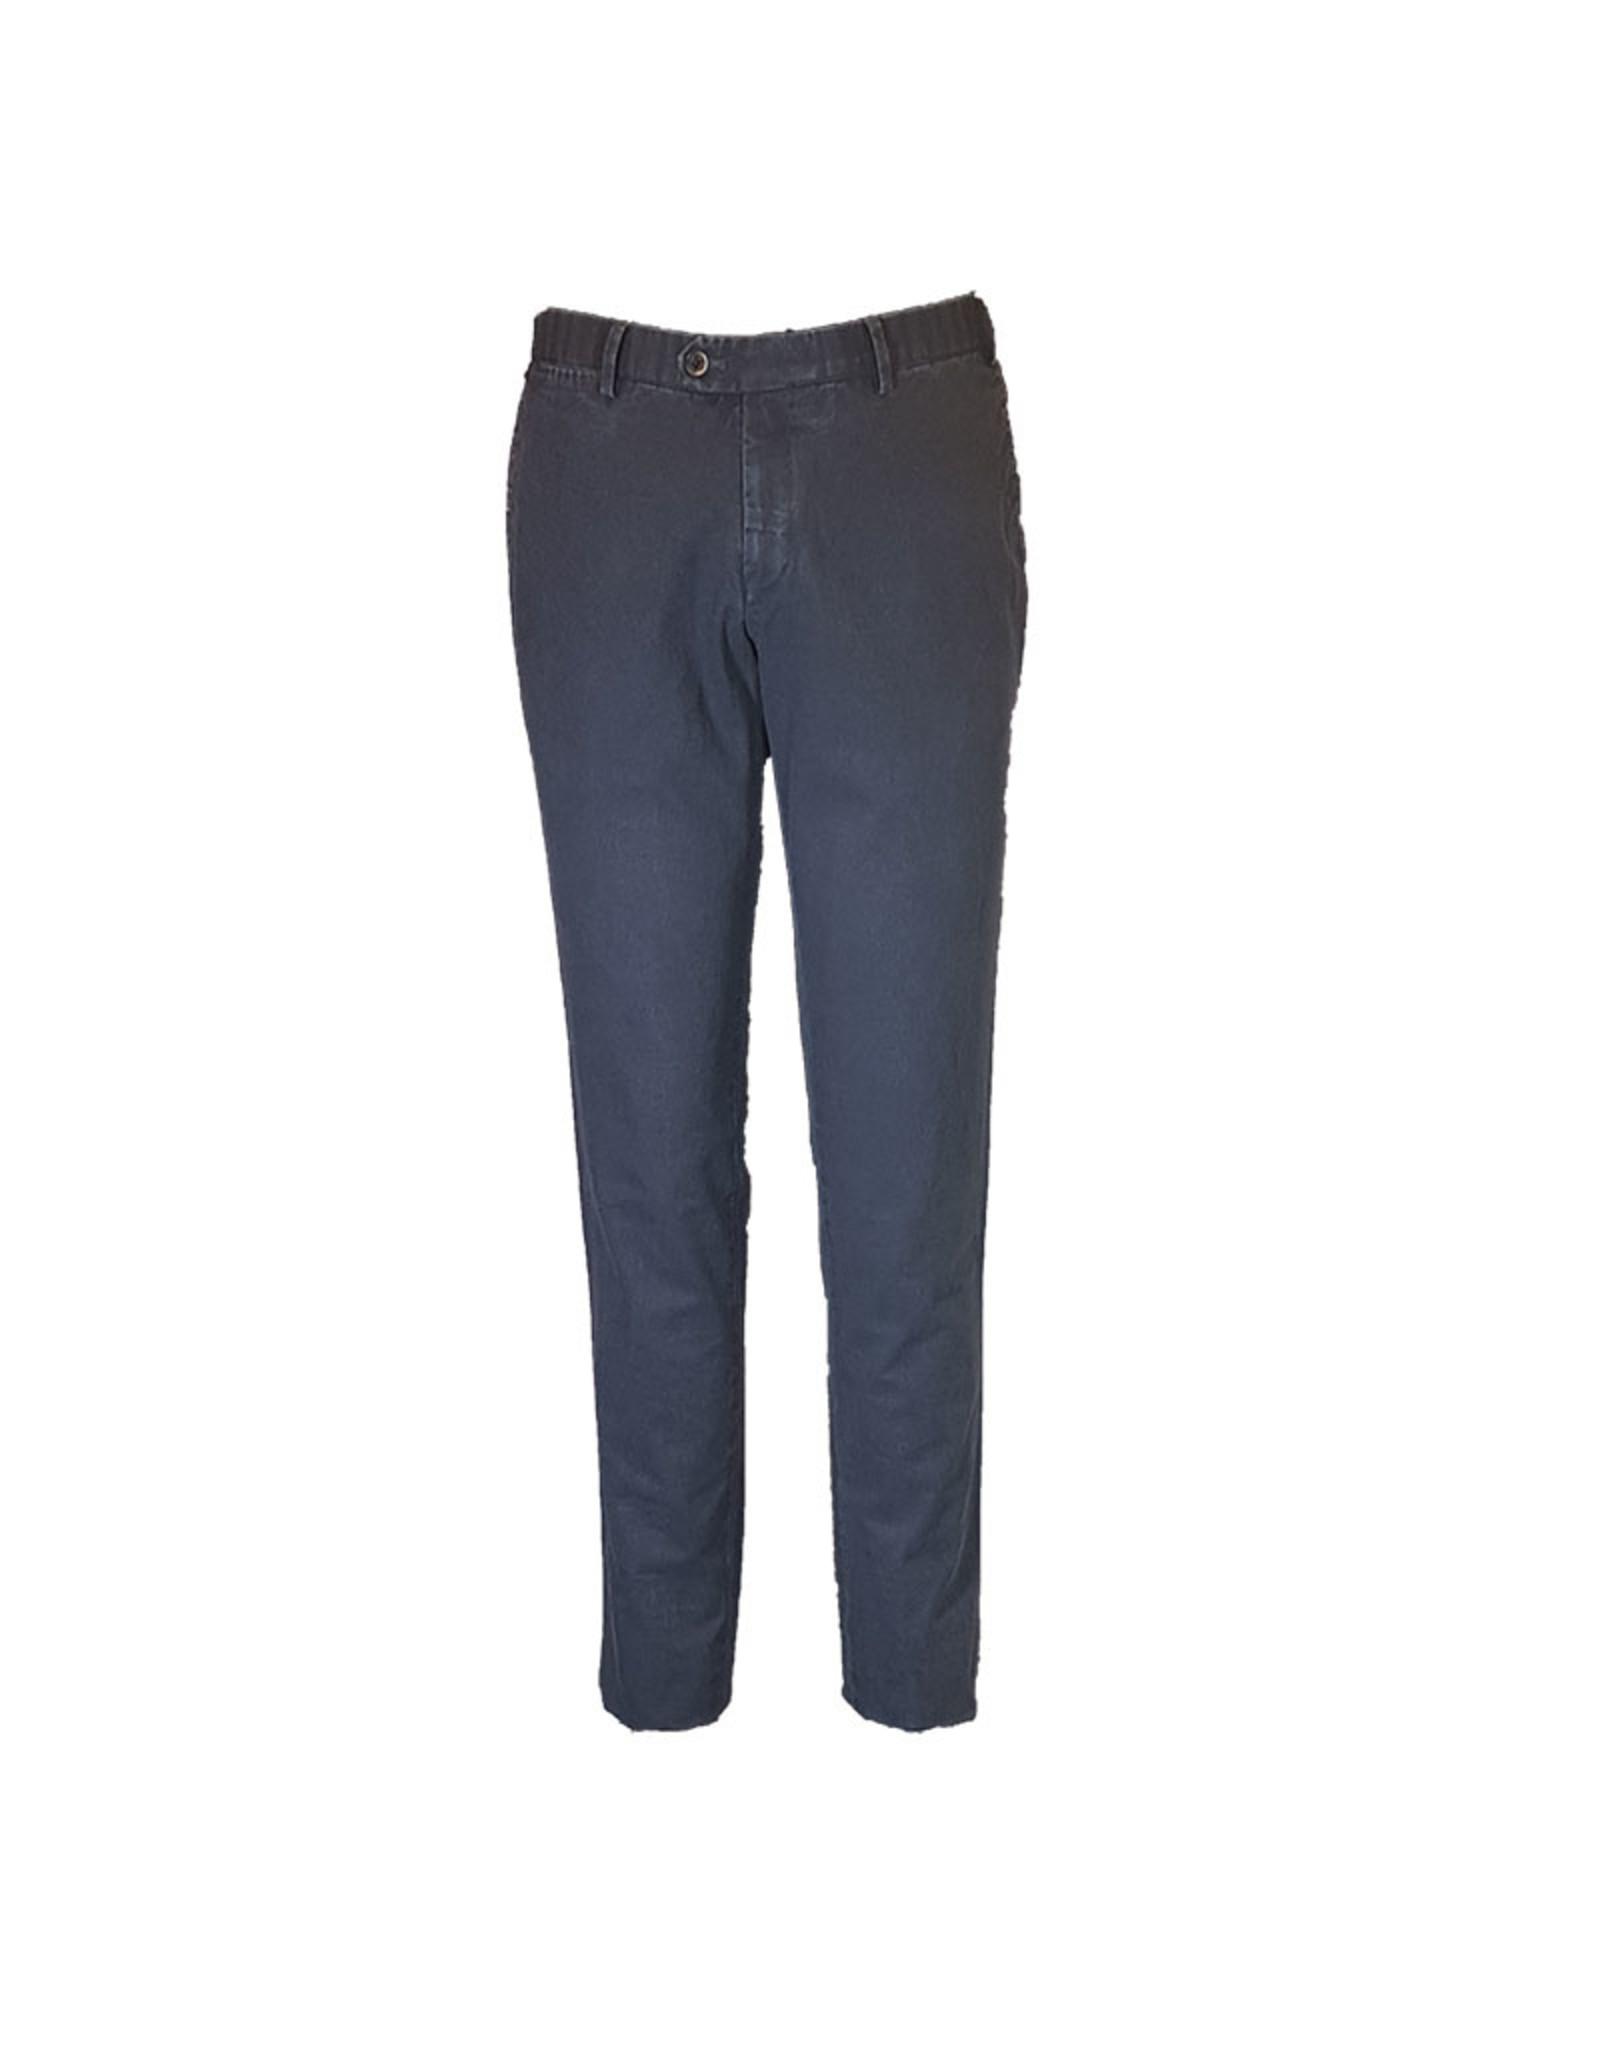 Hiltl Hiltl broek katoen blauw Tian 73017/41